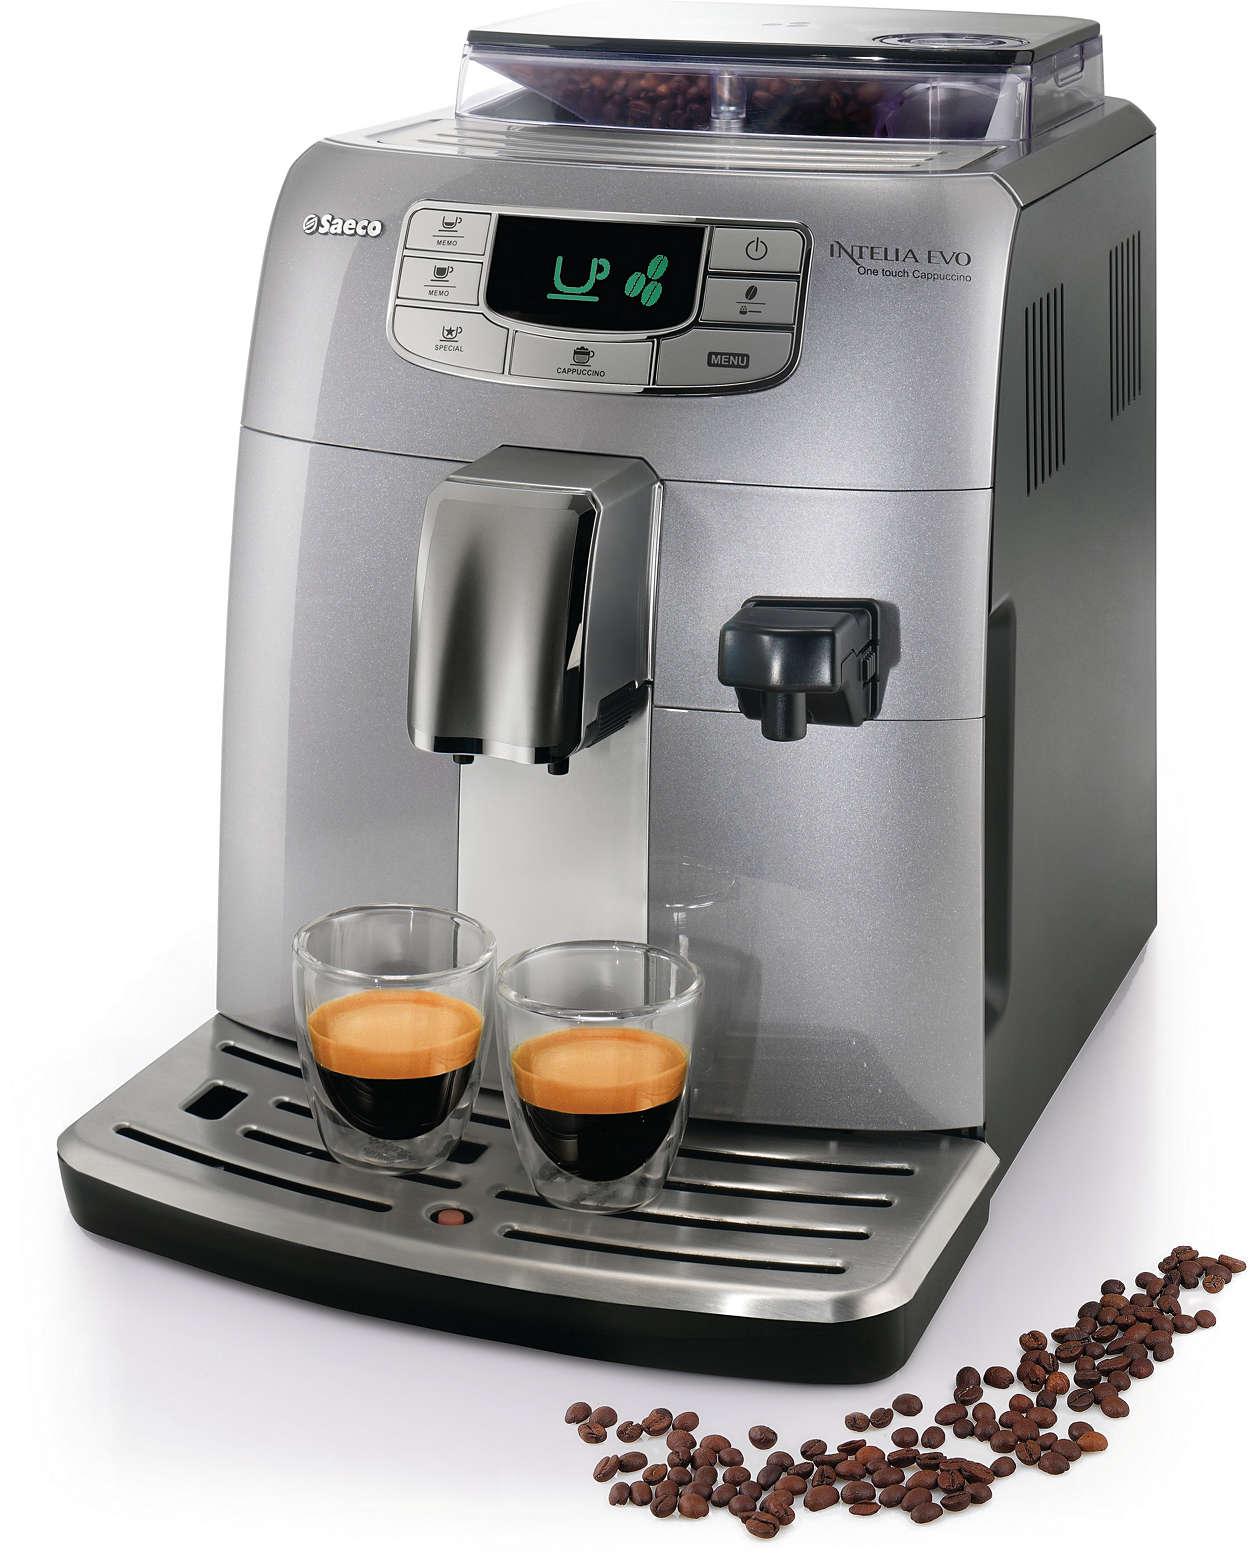 Cappuccino, Automatisch espressoapparaat